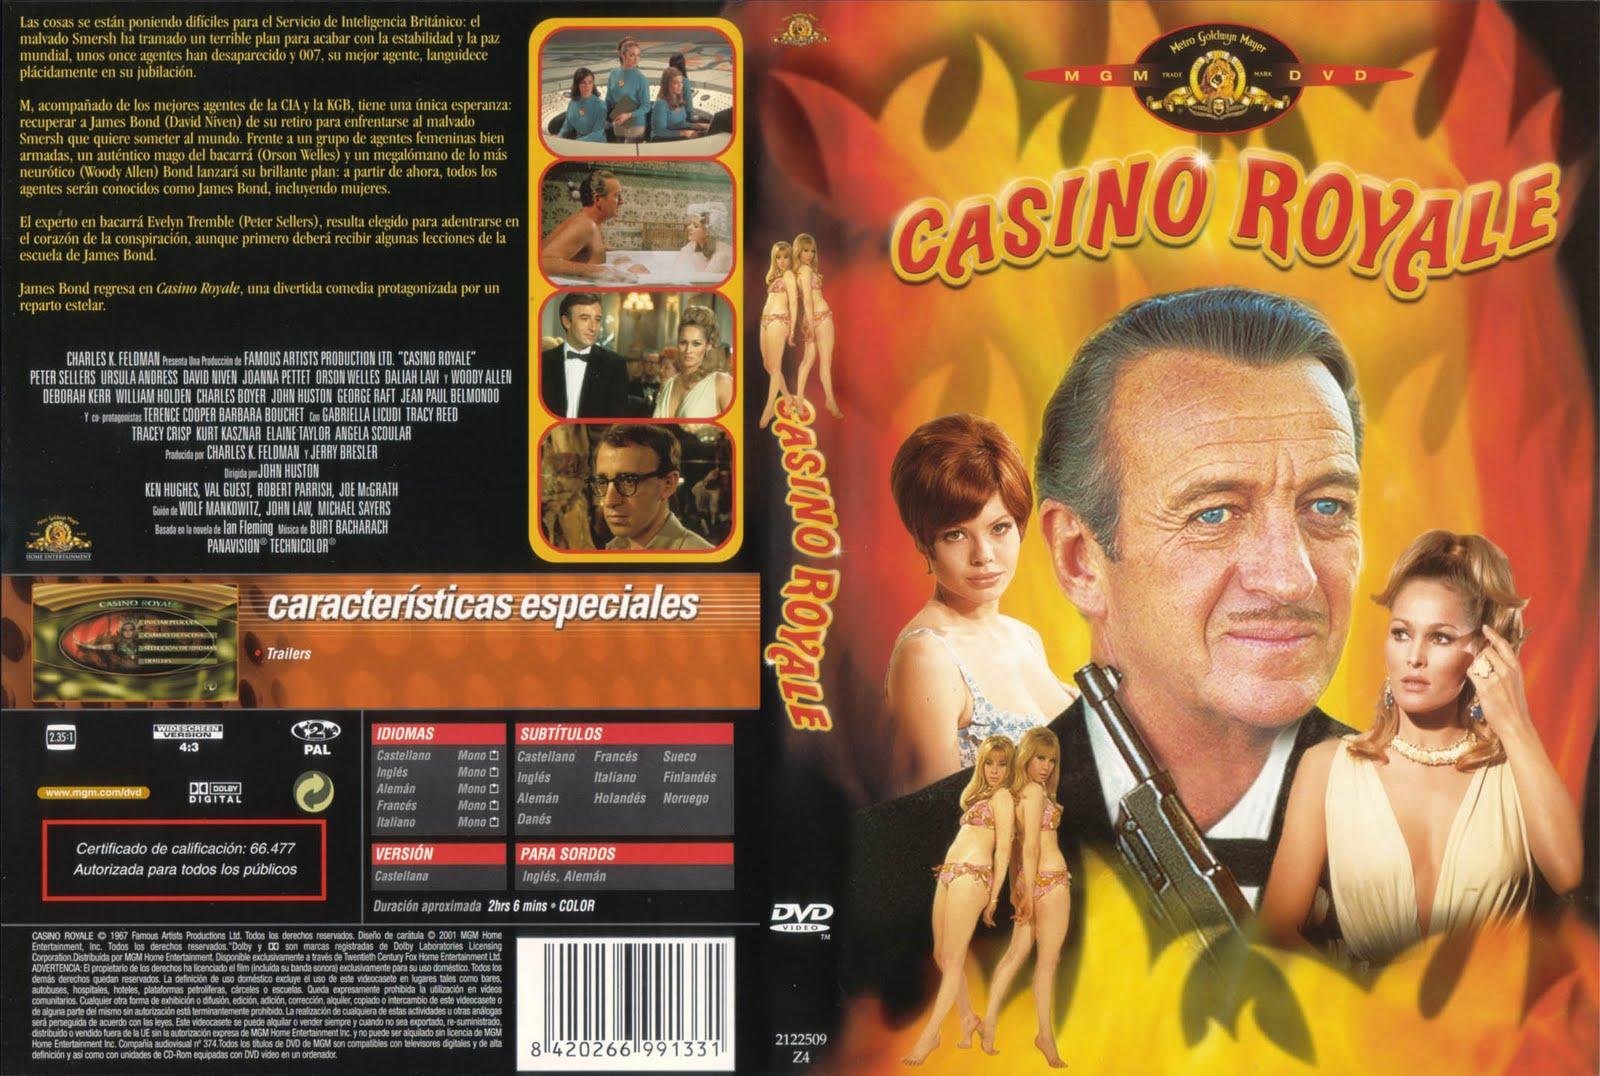 http://2.bp.blogspot.com/-W2x3cKAL_68/ThGcBZQmAnI/AAAAAAAAAS0/UiYJLTd3Ucc/s1600/Casino_Royale-Caratula.jpg